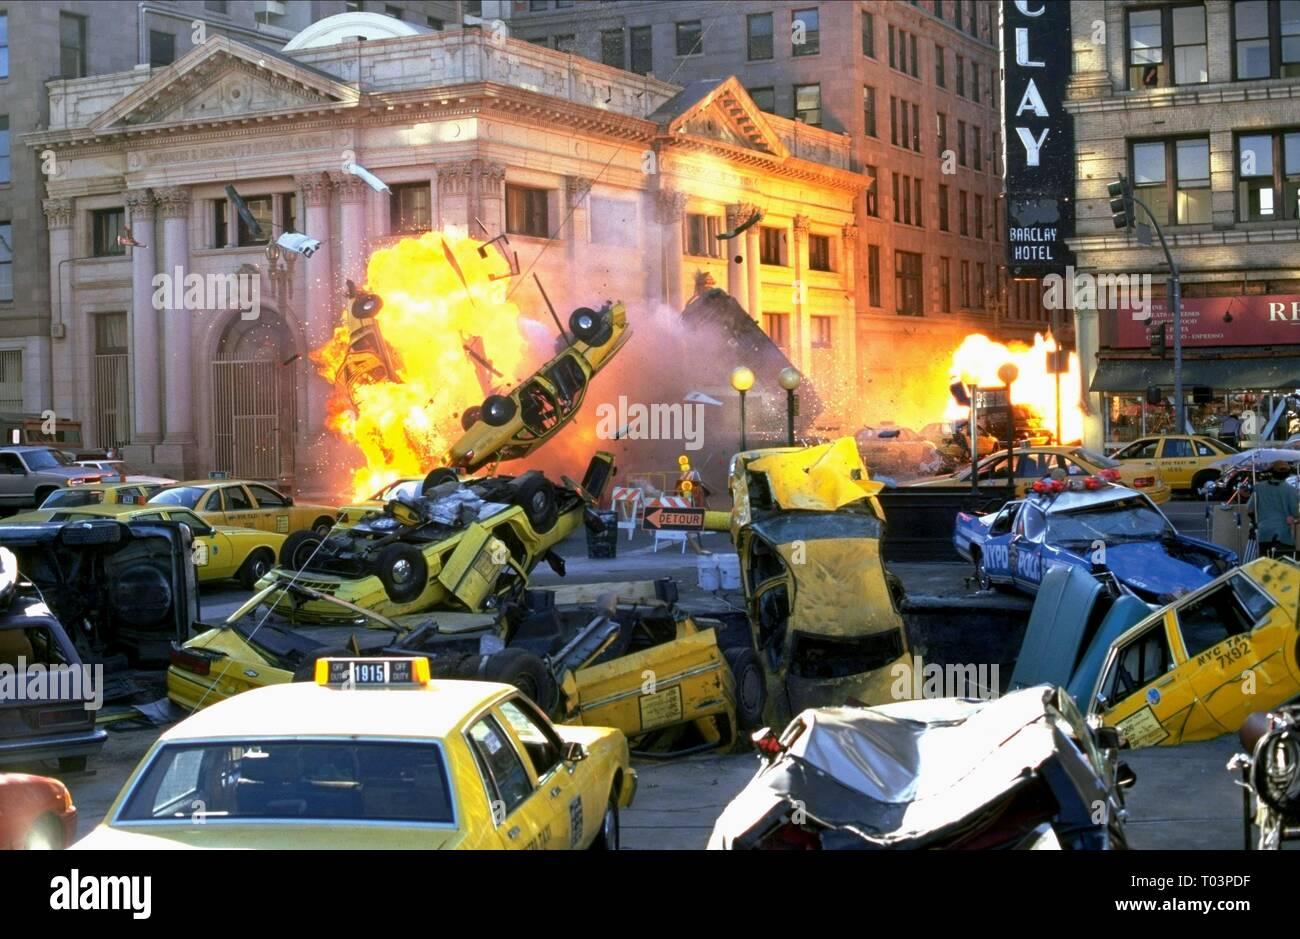 ARMAGEDDON, EXPLOSION SCENE, 1998 - Stock Image